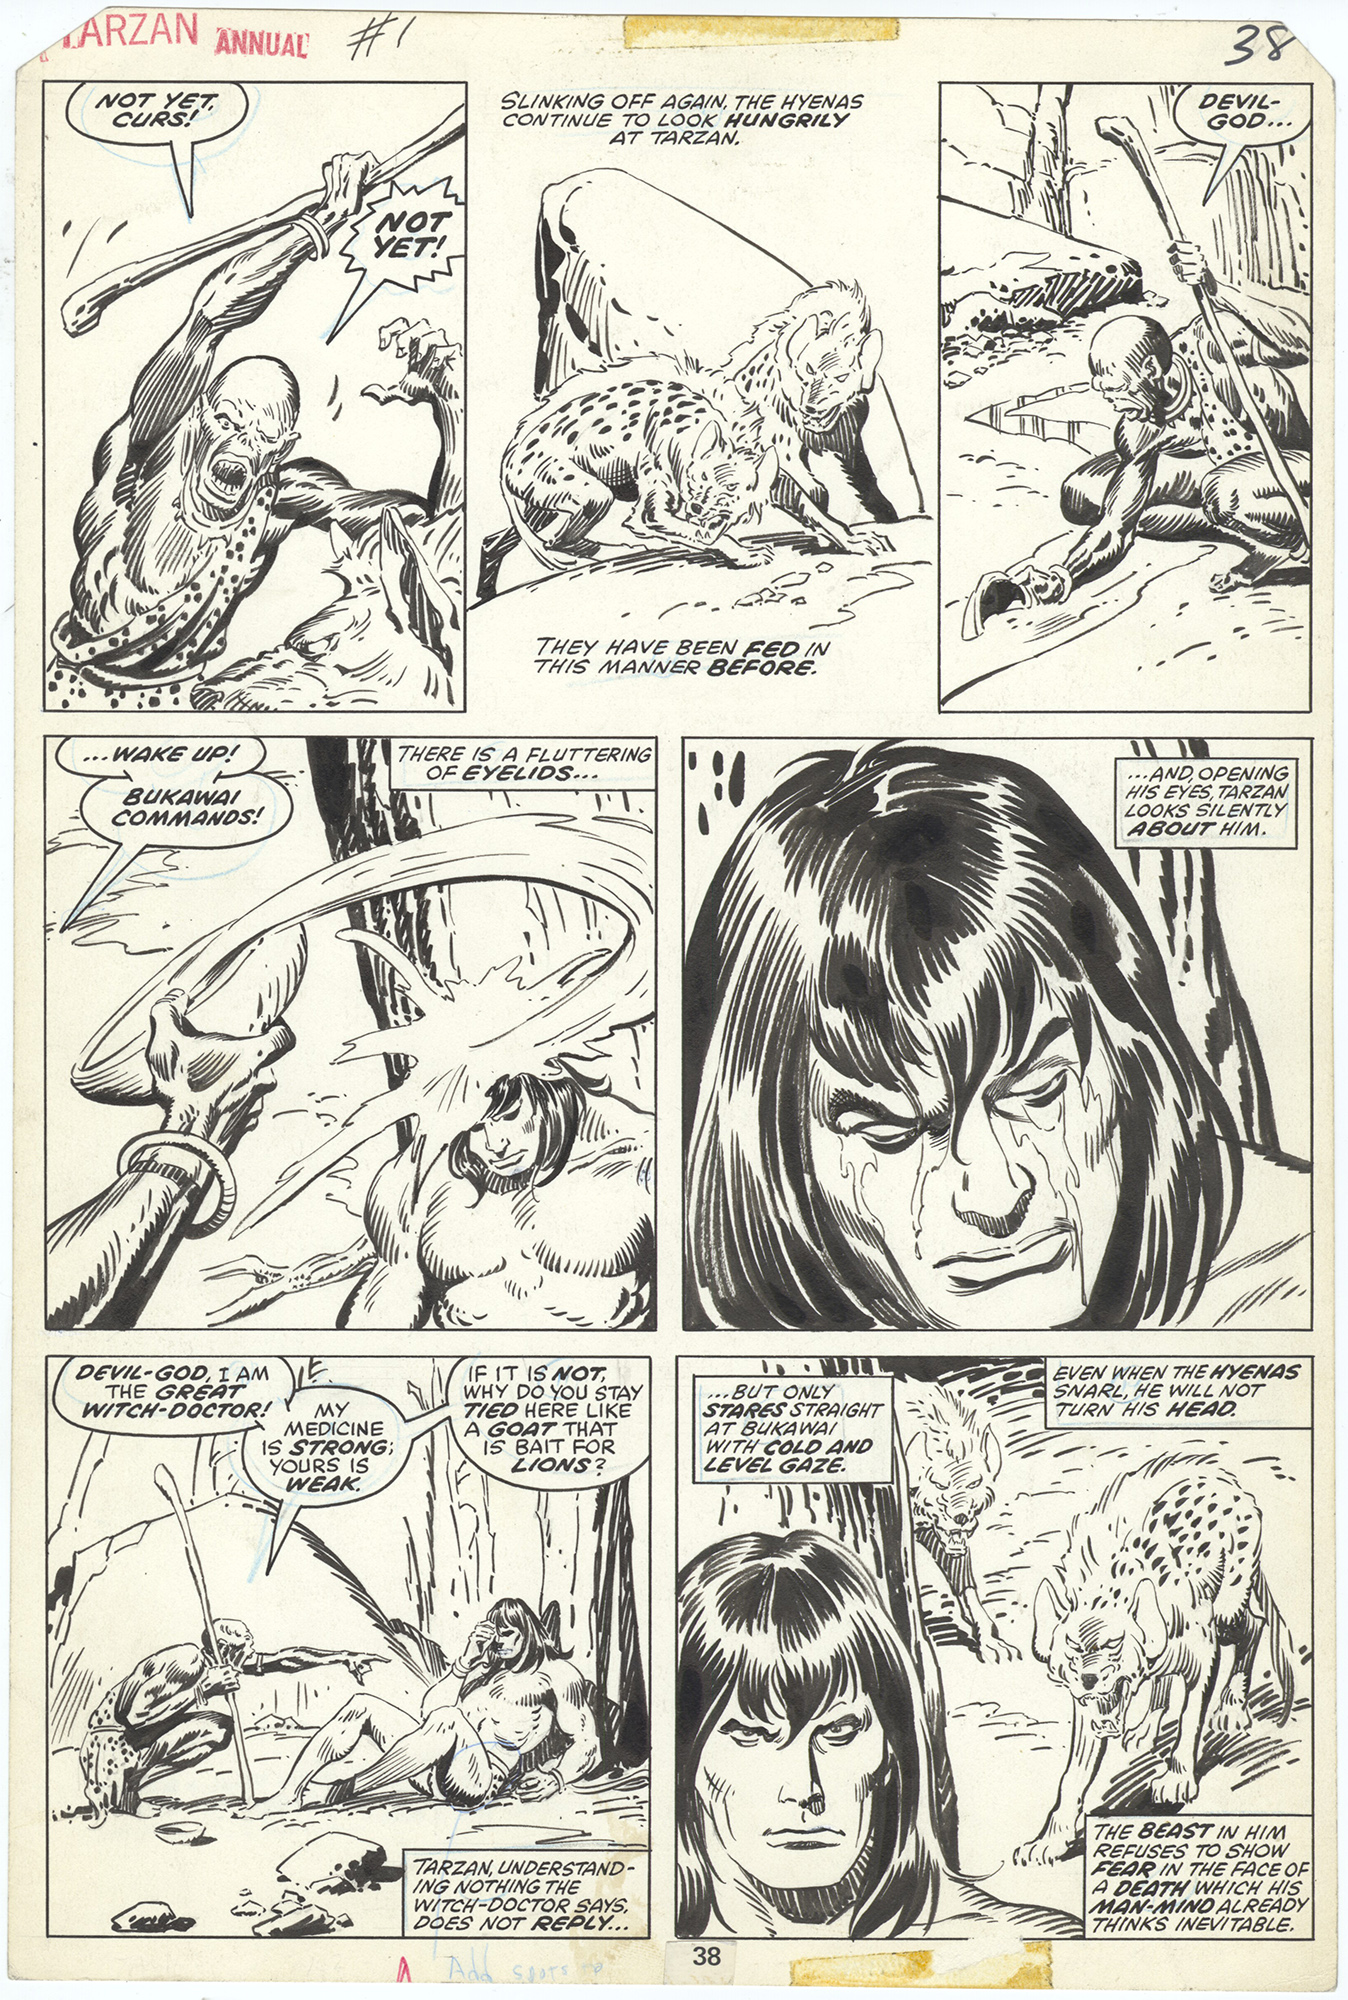 Tarzan Annual #1 p38